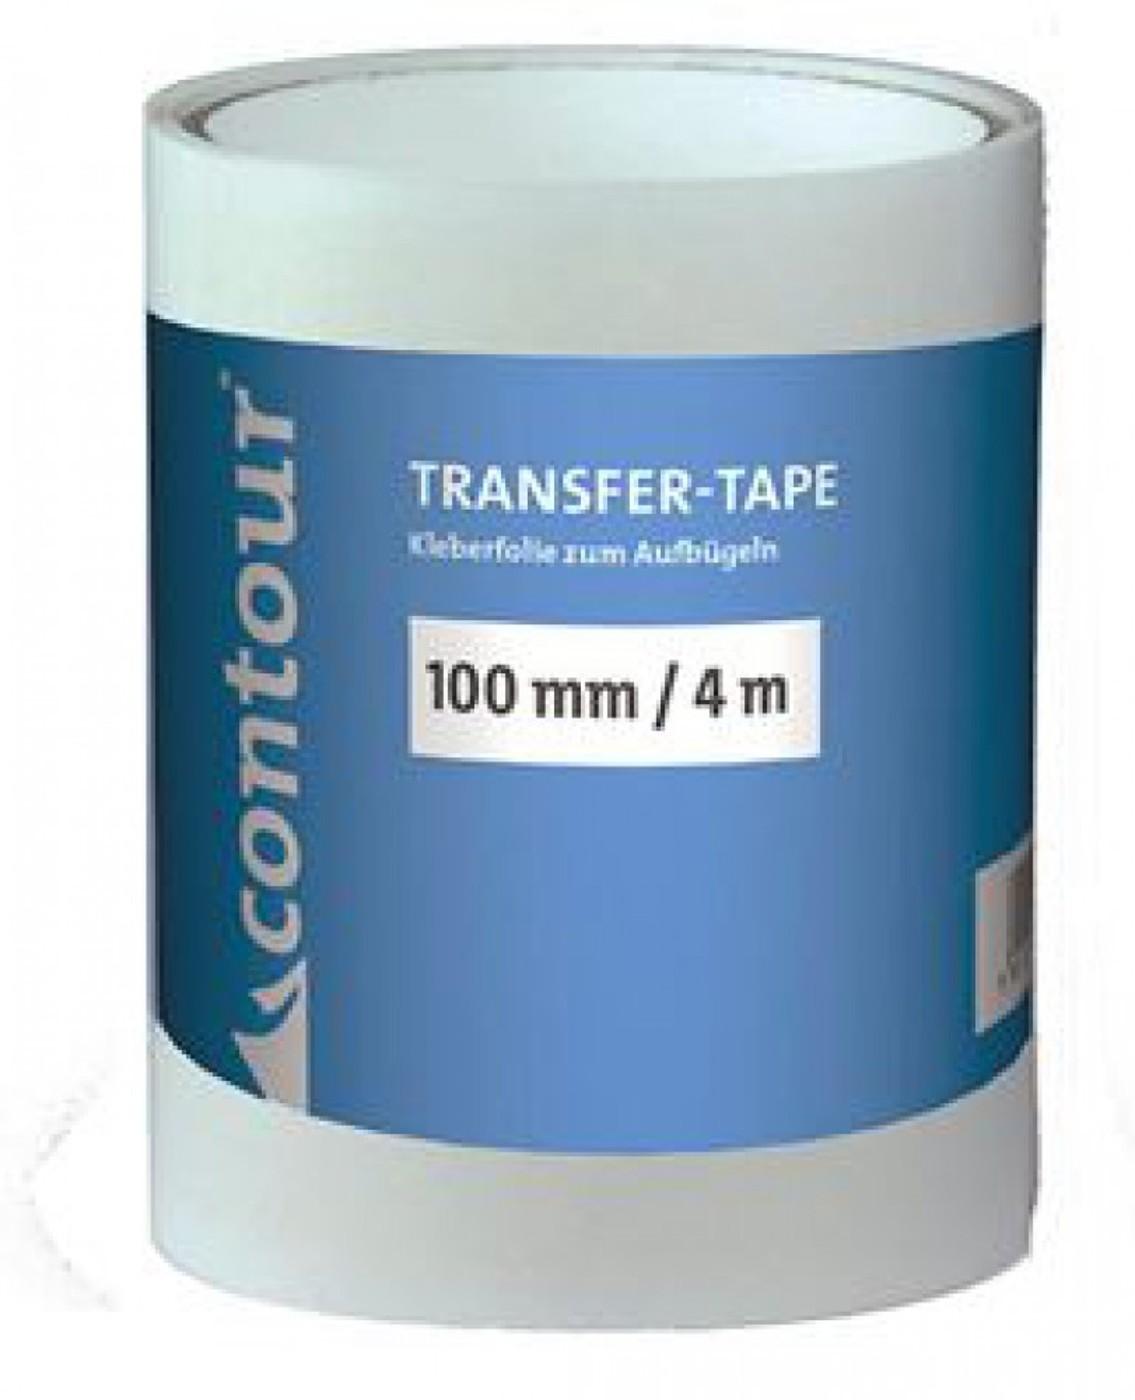 CONTOUR transfer-tape Kleberfolie 4 m